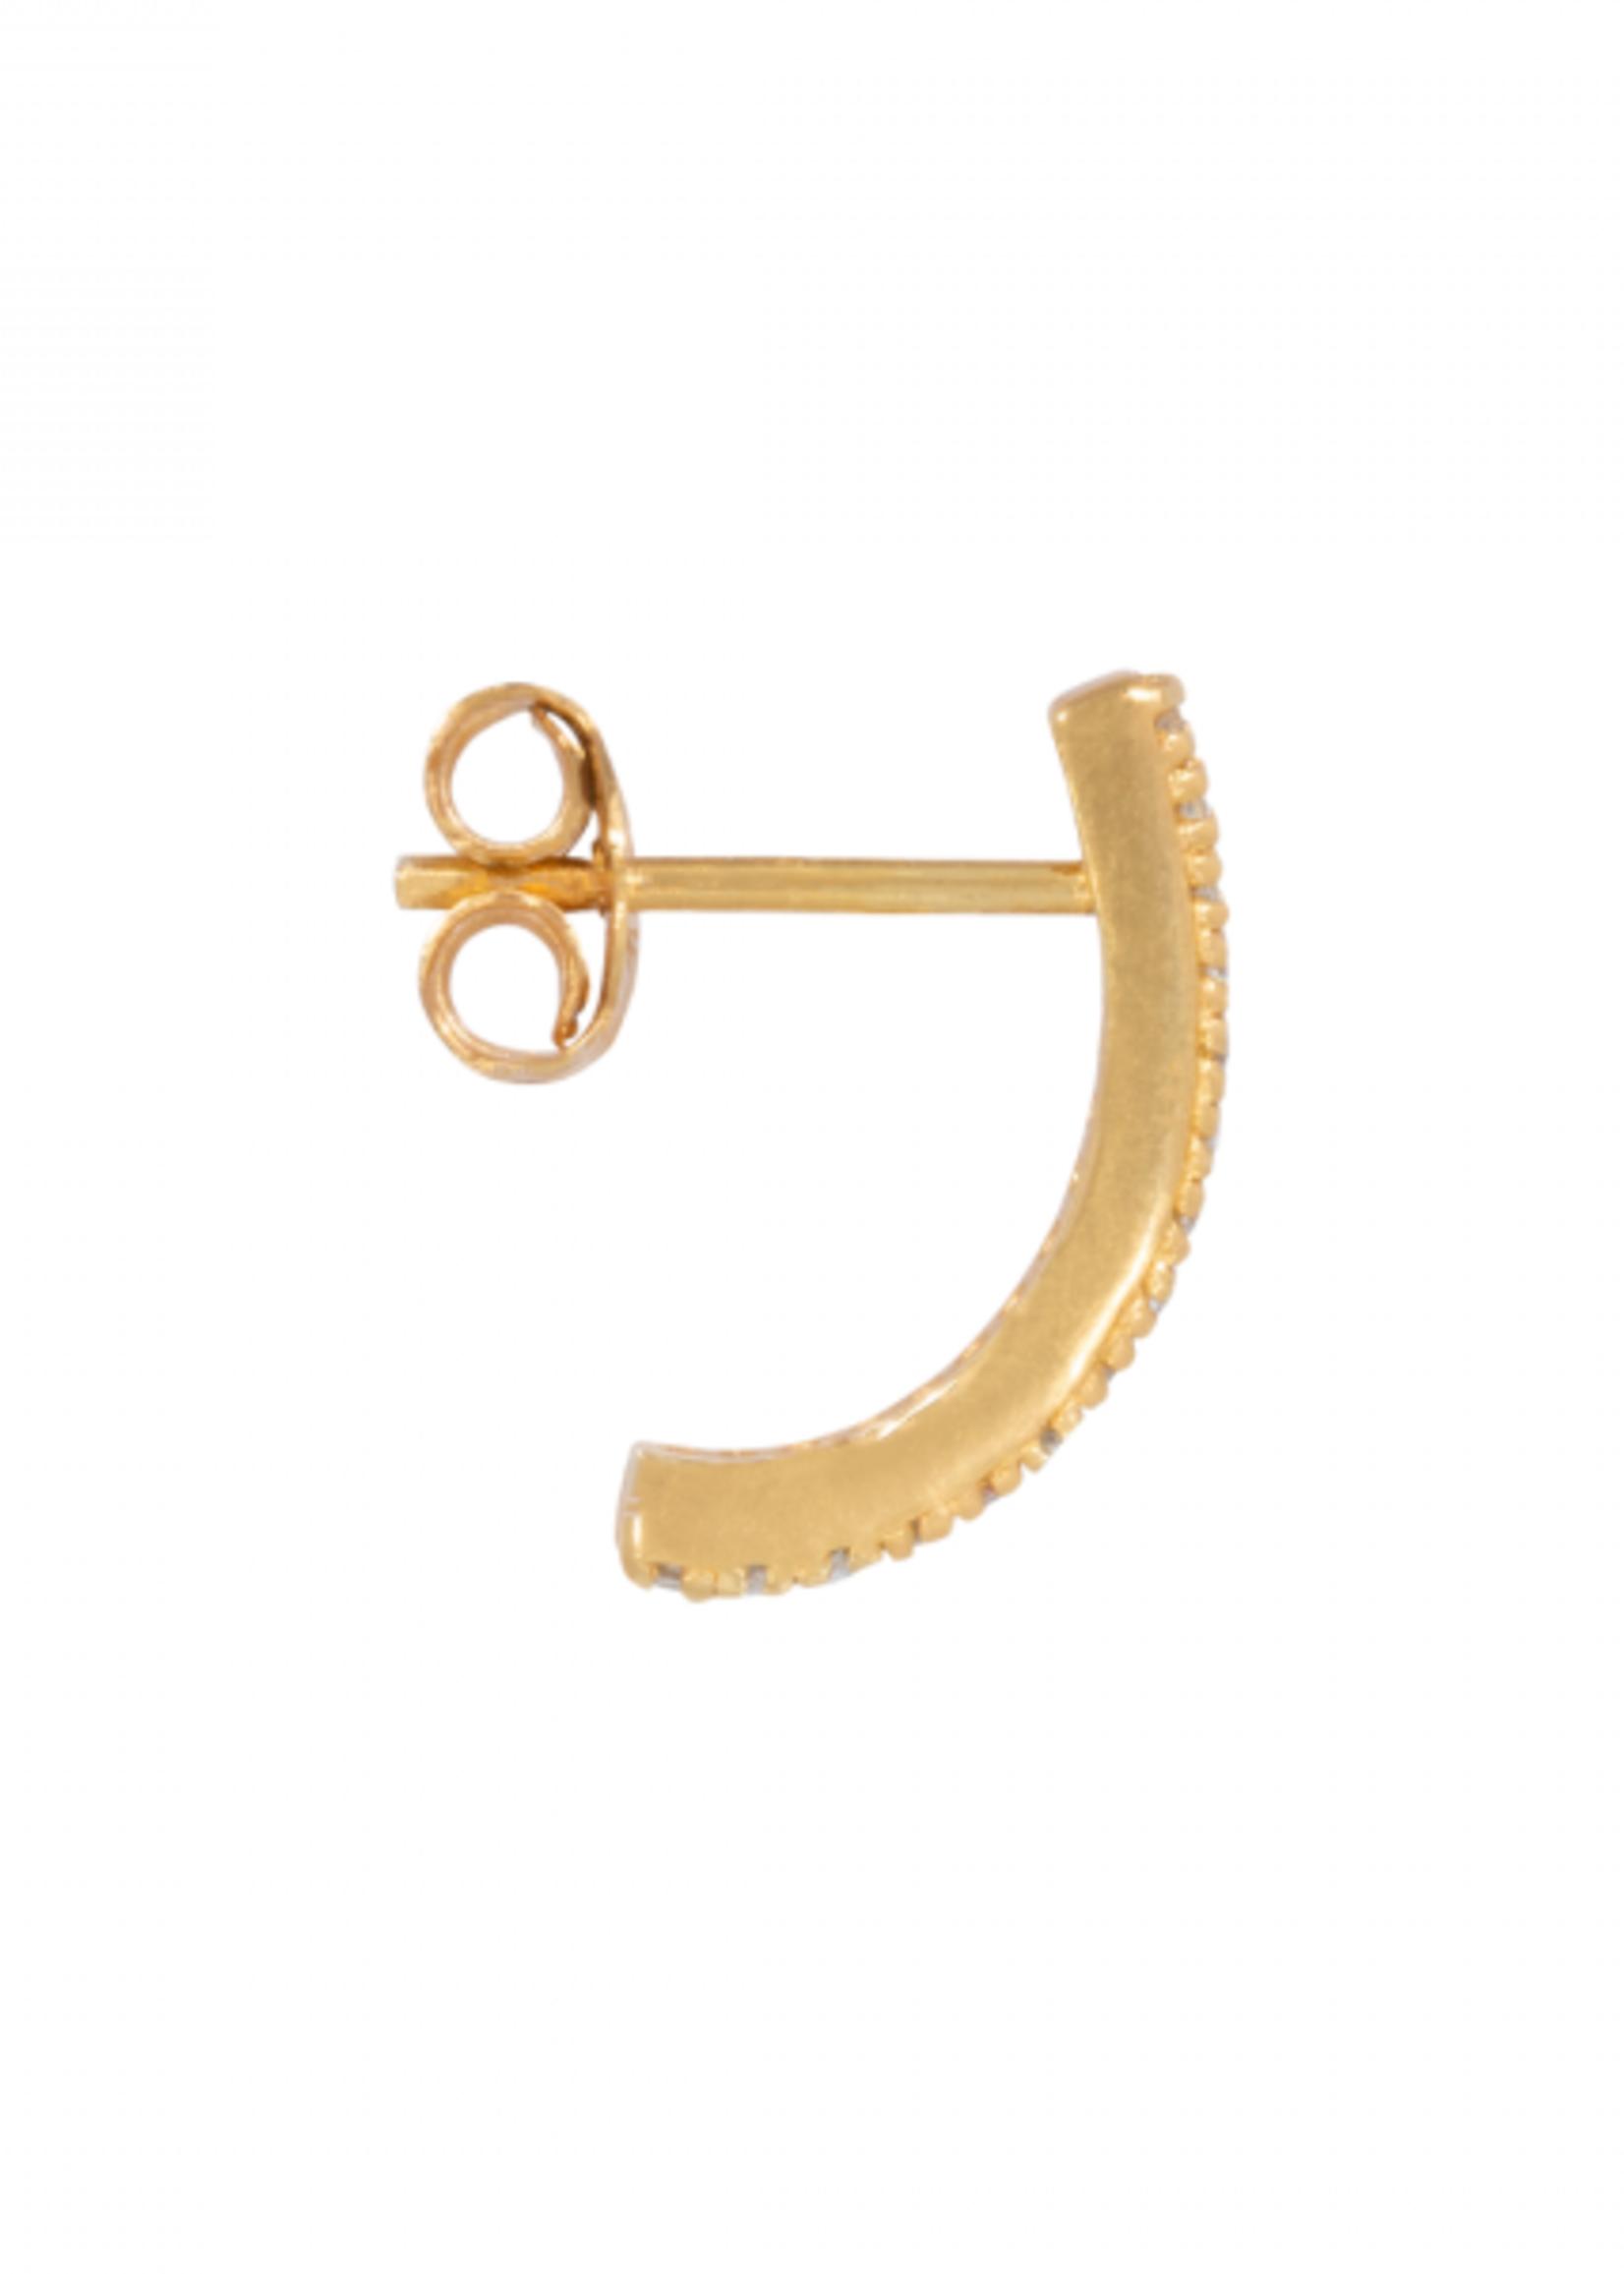 Eline Rosina Single hook in gold plated